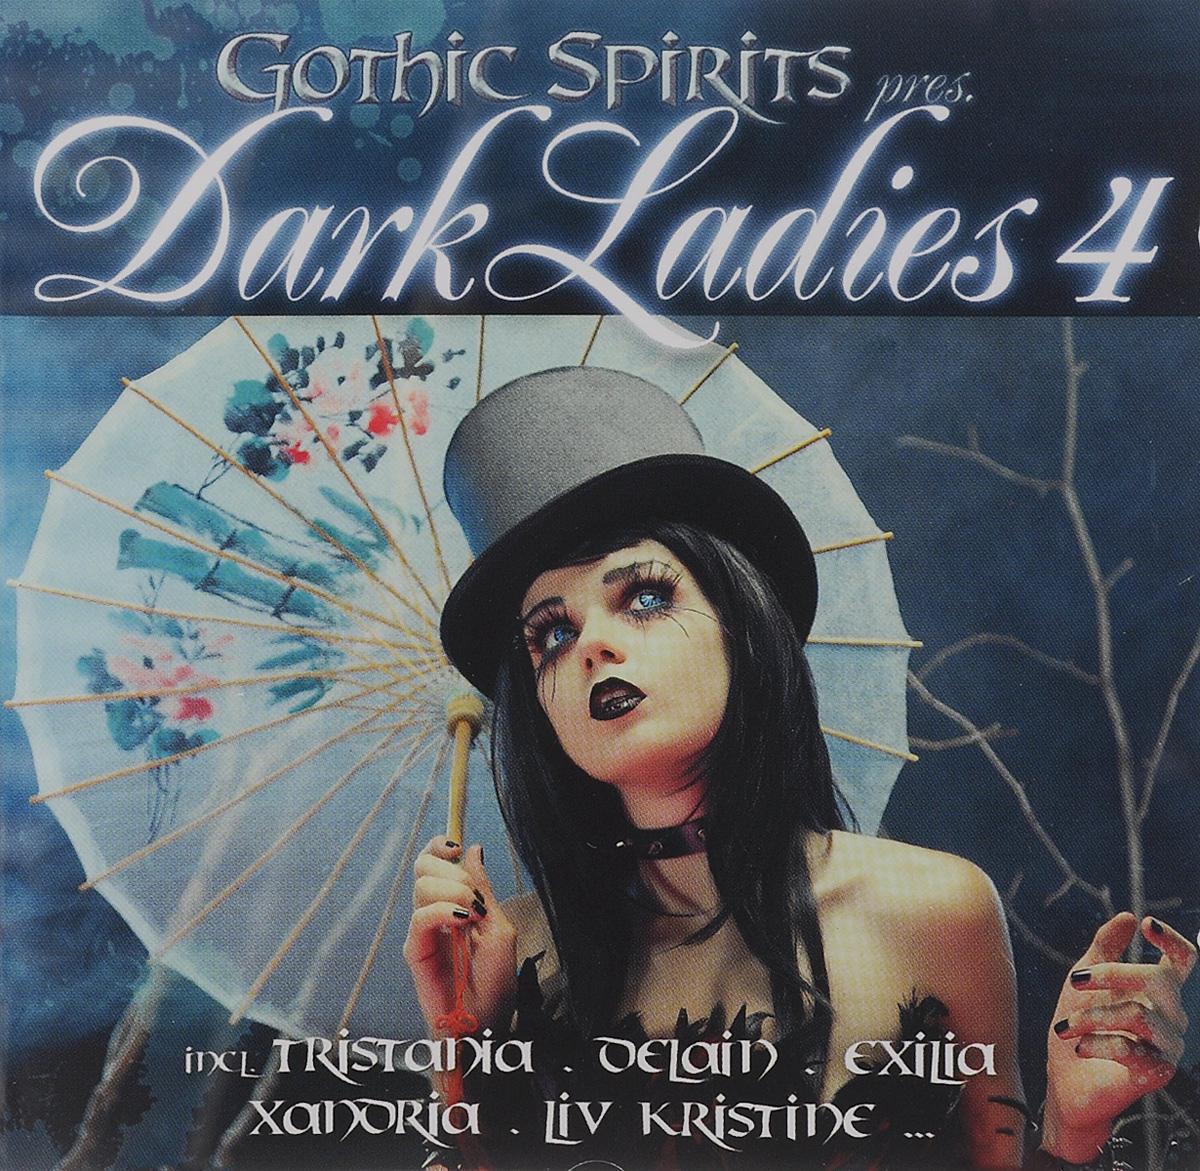 Tristania,Arven,Delain,Helalyn Flowers,Stream Of Passion,Visions Of Atlantis,Xandria,In Strict Confidence,Лив Кристин,Nemesea Gothic Spirits Pres. Dark Ladies 4 цена